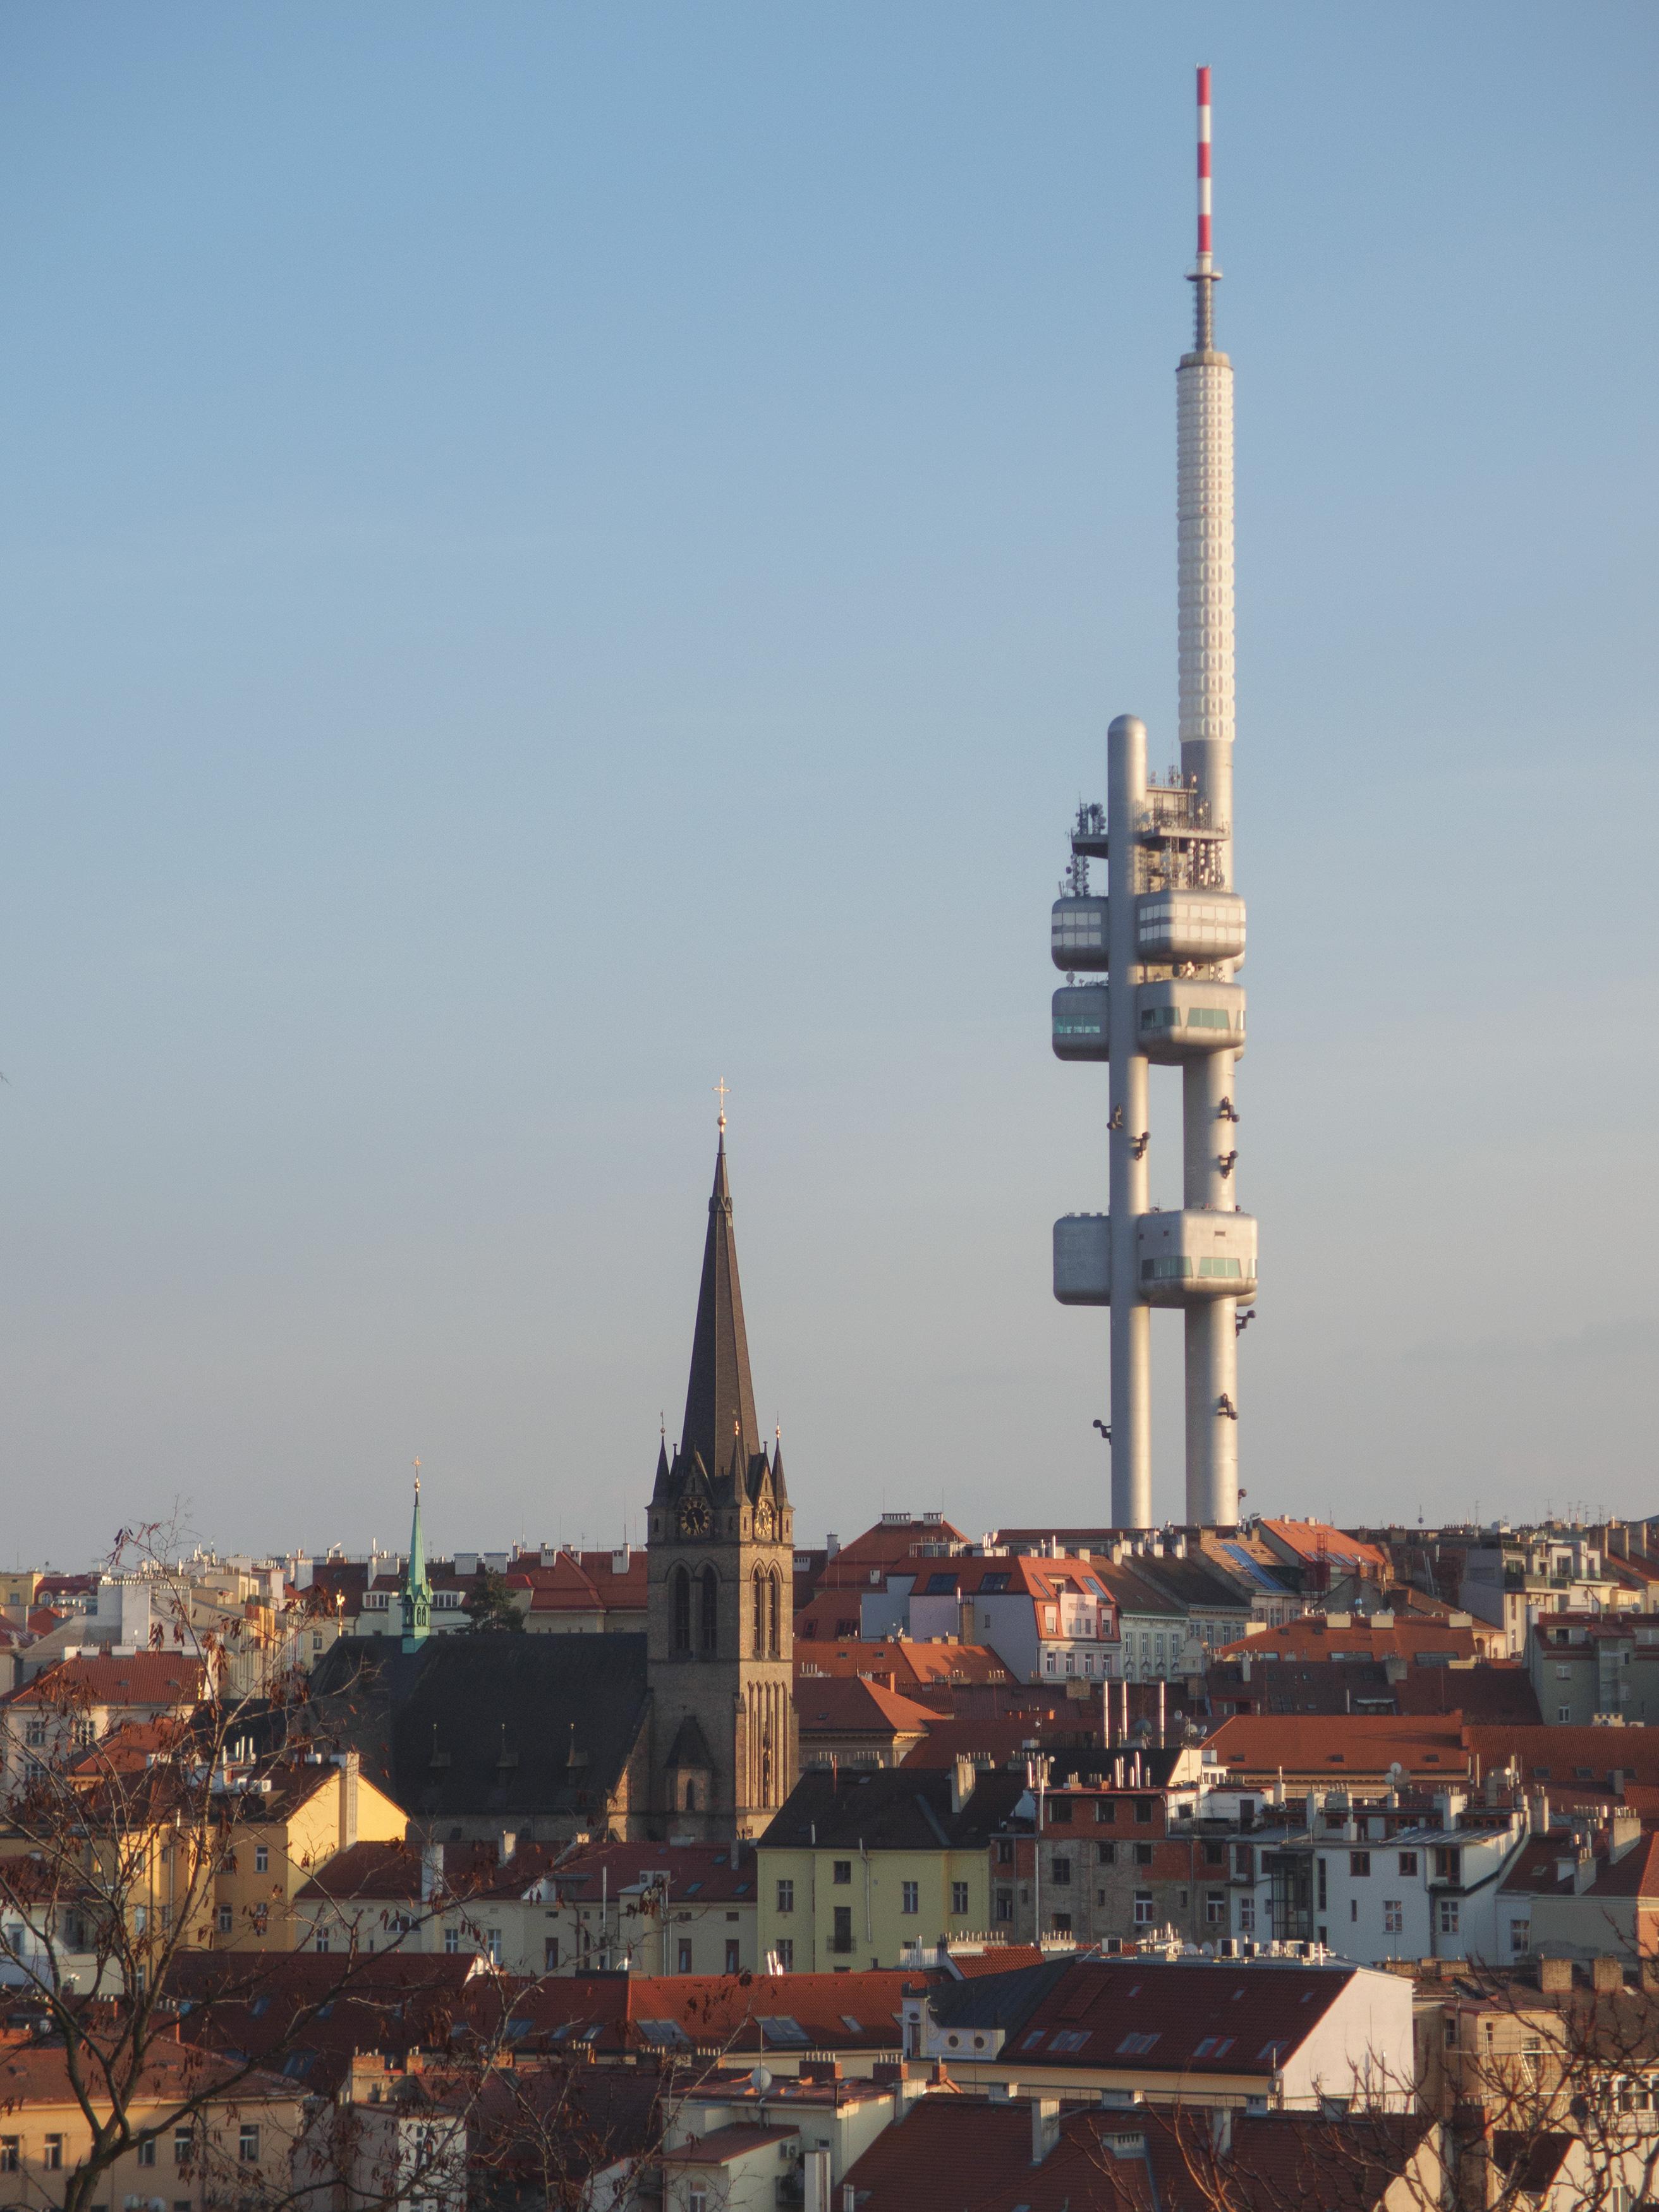 Free Image: Prague TV Tower | Libreshot Public Domain Photos